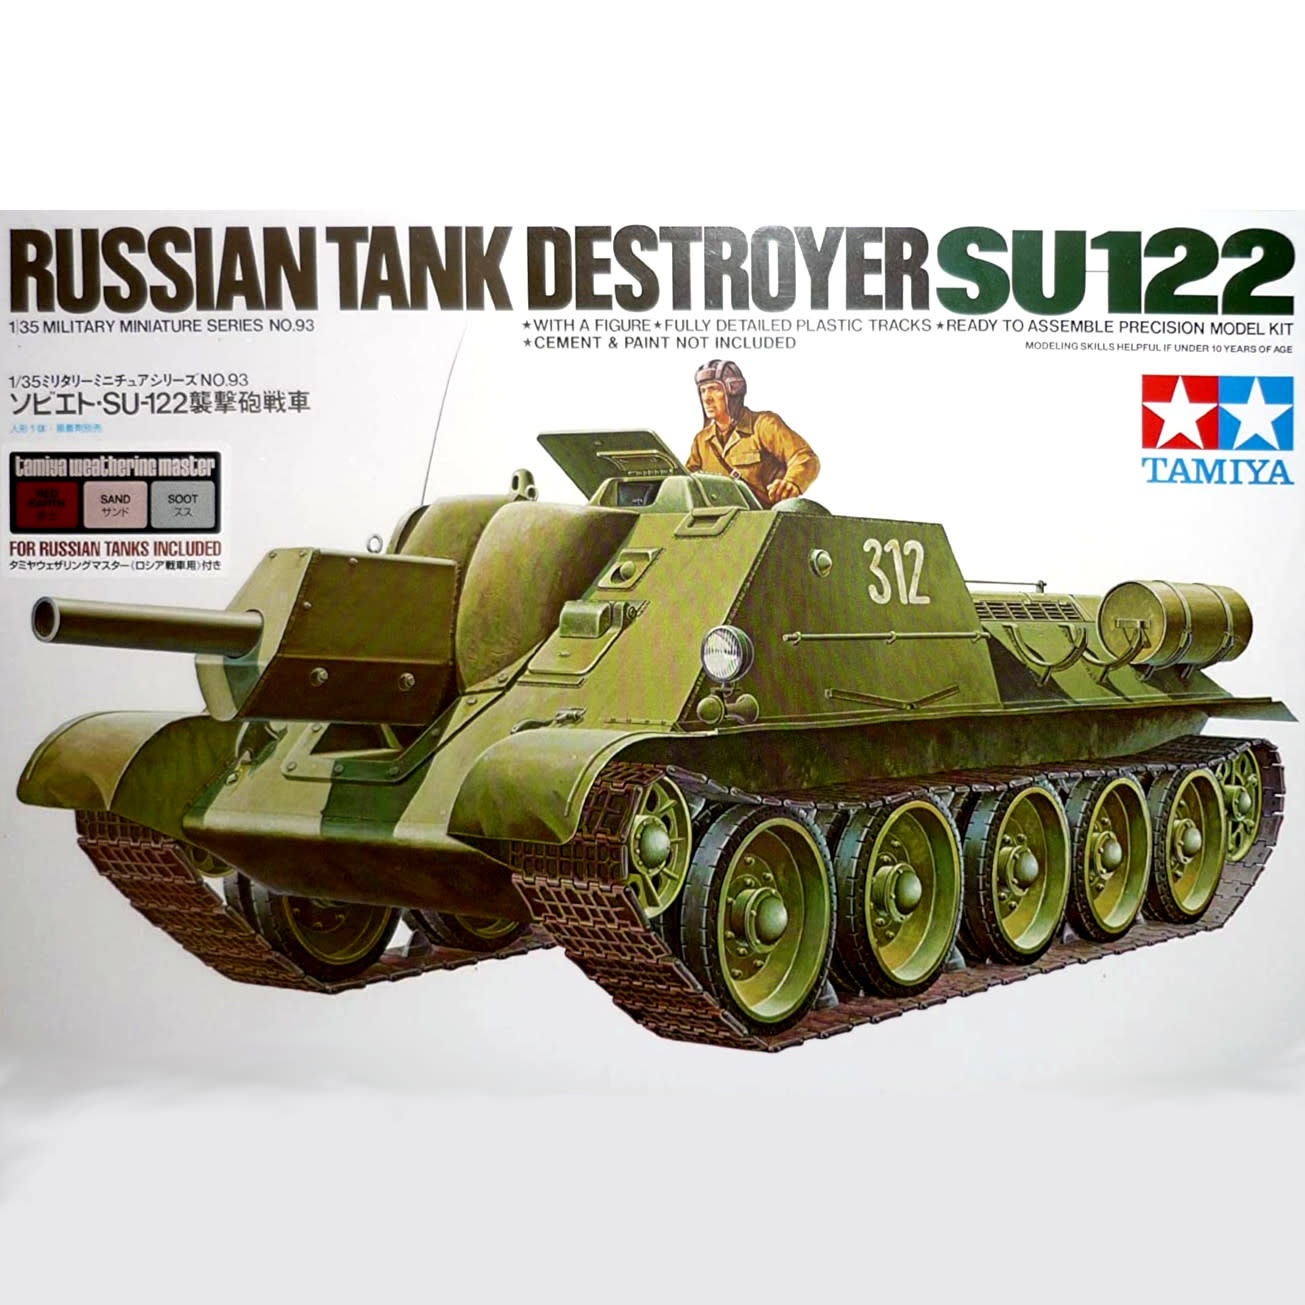 1/35 Russian TankDestroyerSU-122